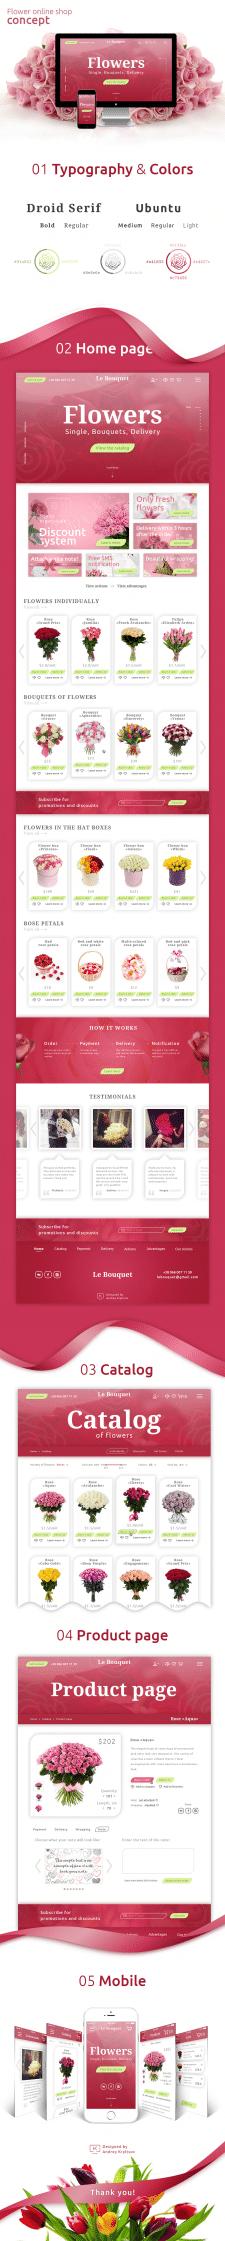 Интернет-магазин цветов. Презентация